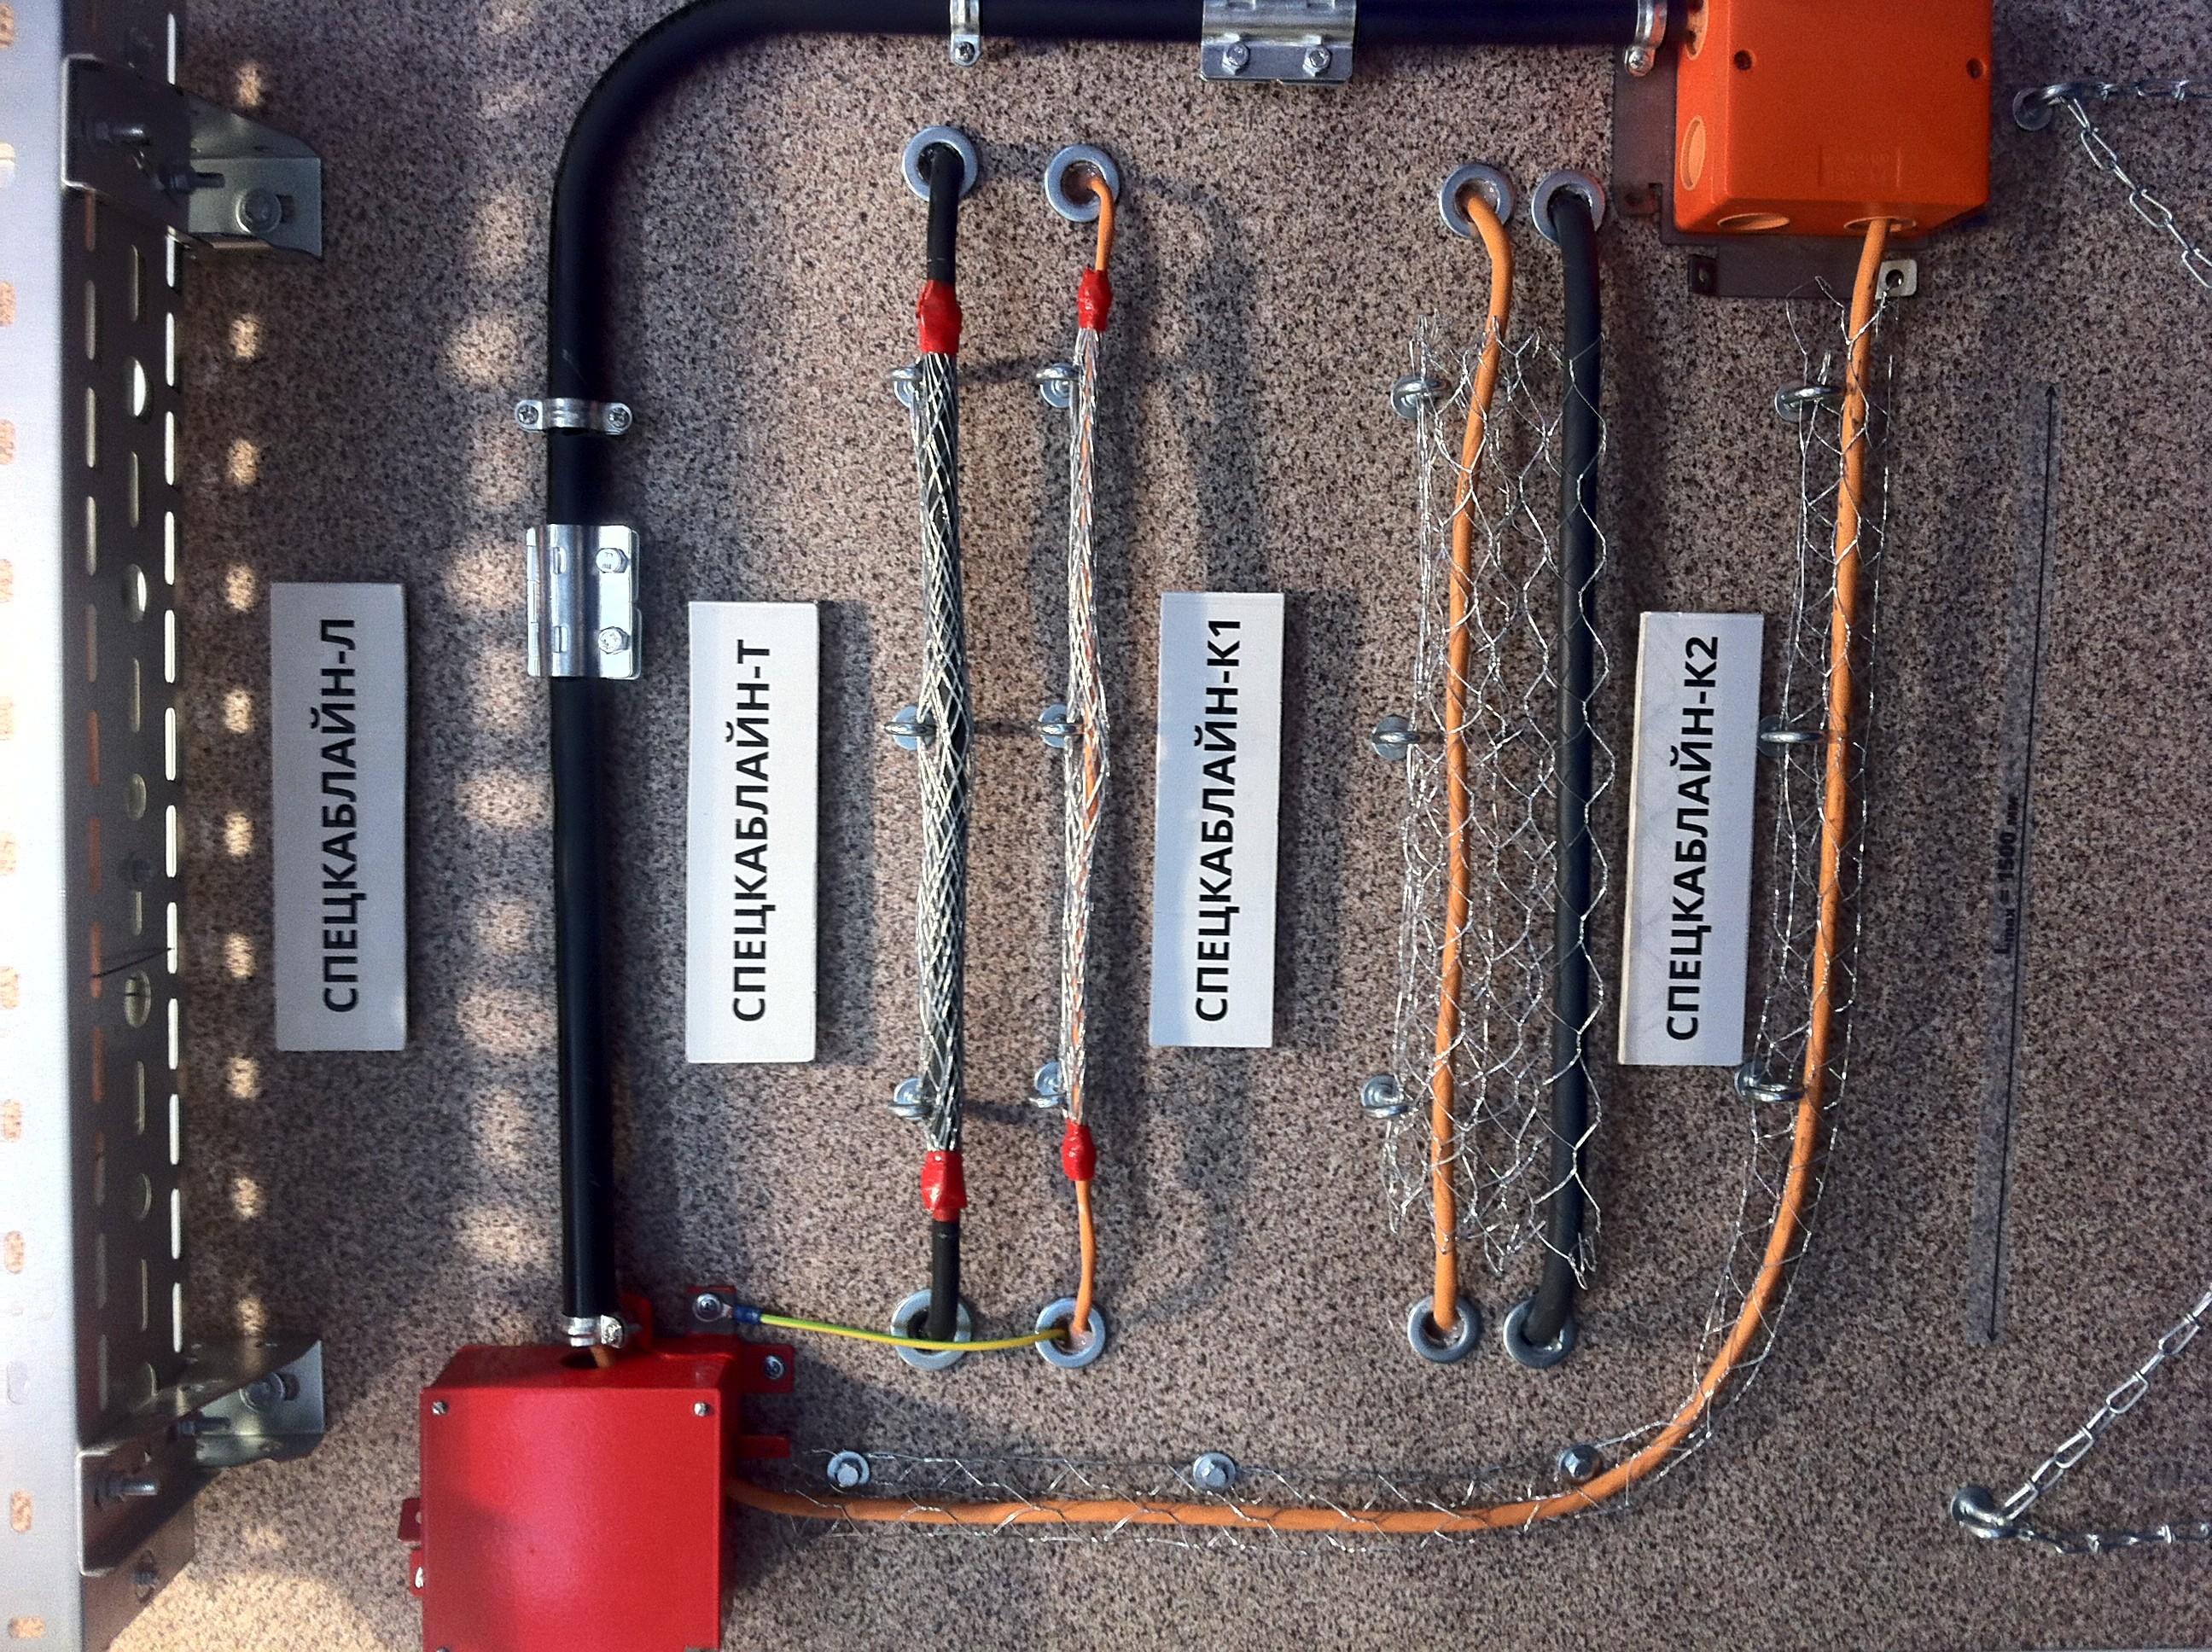 Ognjeodporne kabelske penetracije